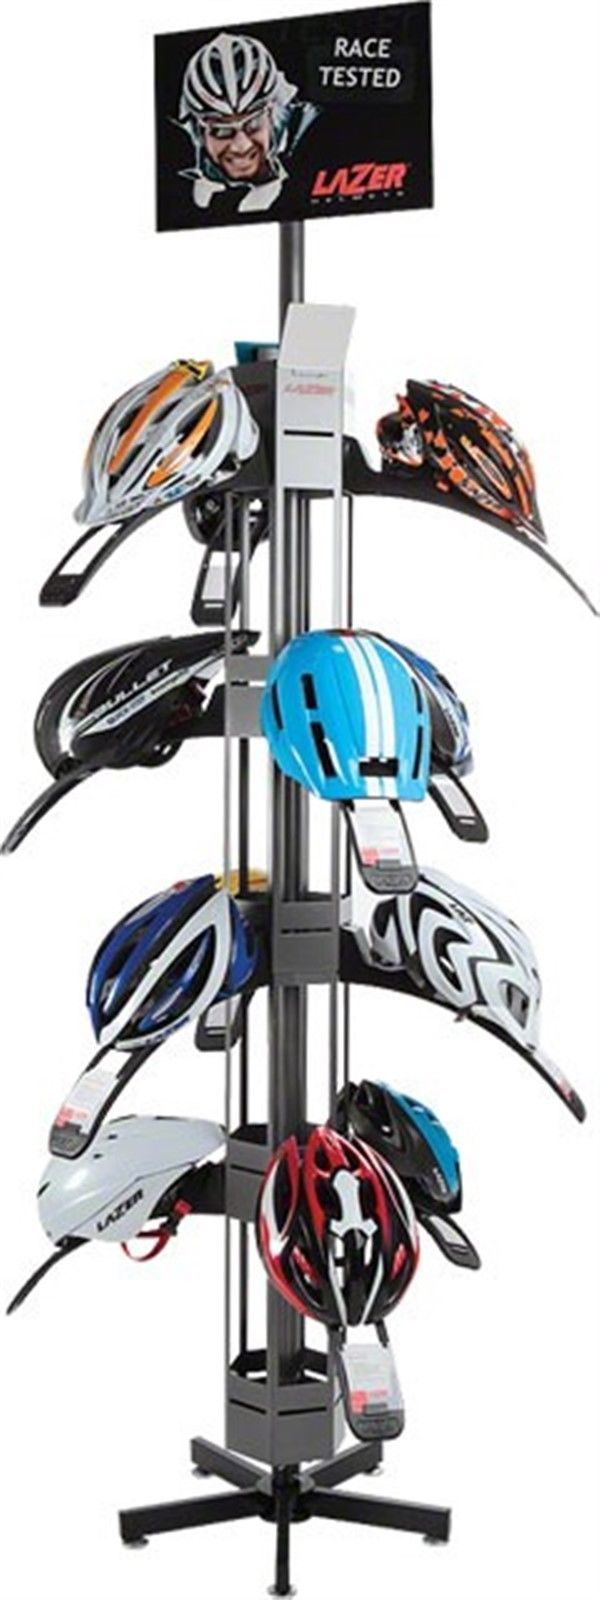 Helmet Accessories 177865: Lazer Helmet Display Tower 1 Of 2 BUY IT NOW ONLY: $221.39